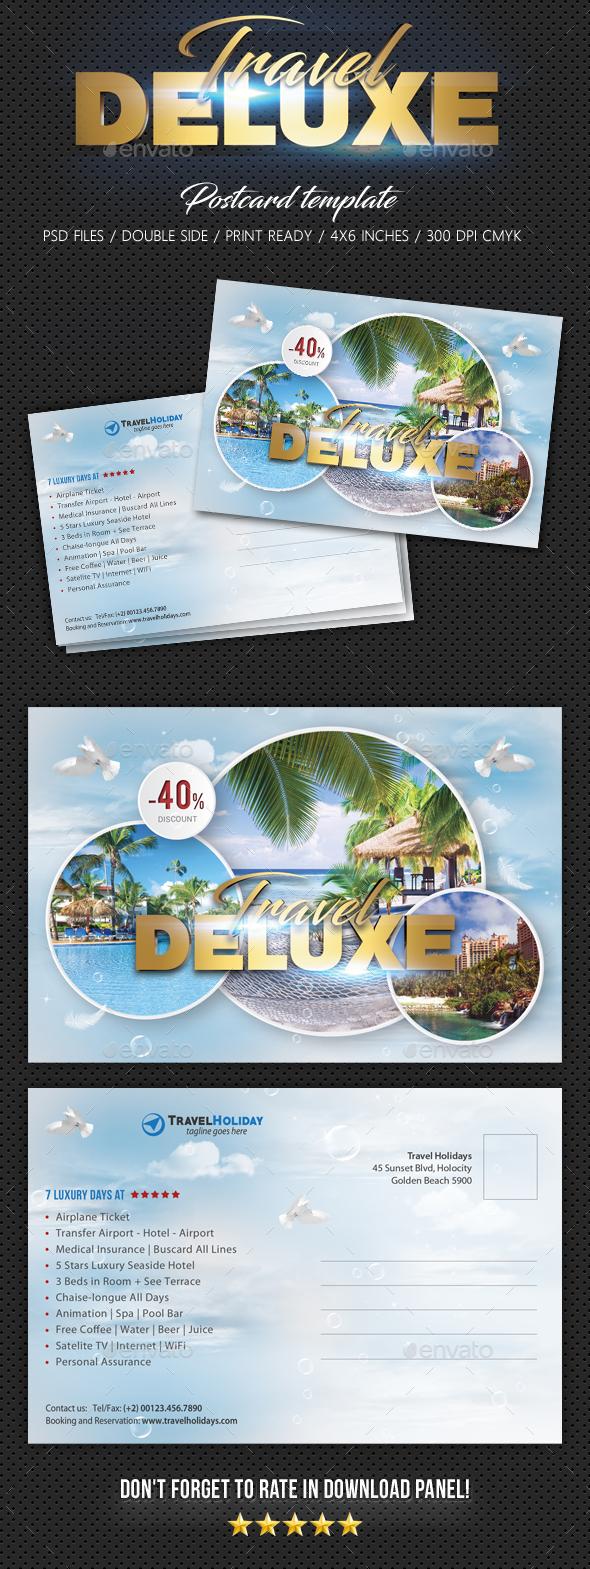 Travel Tour Postcard Template - Cards & Invites Print Templates